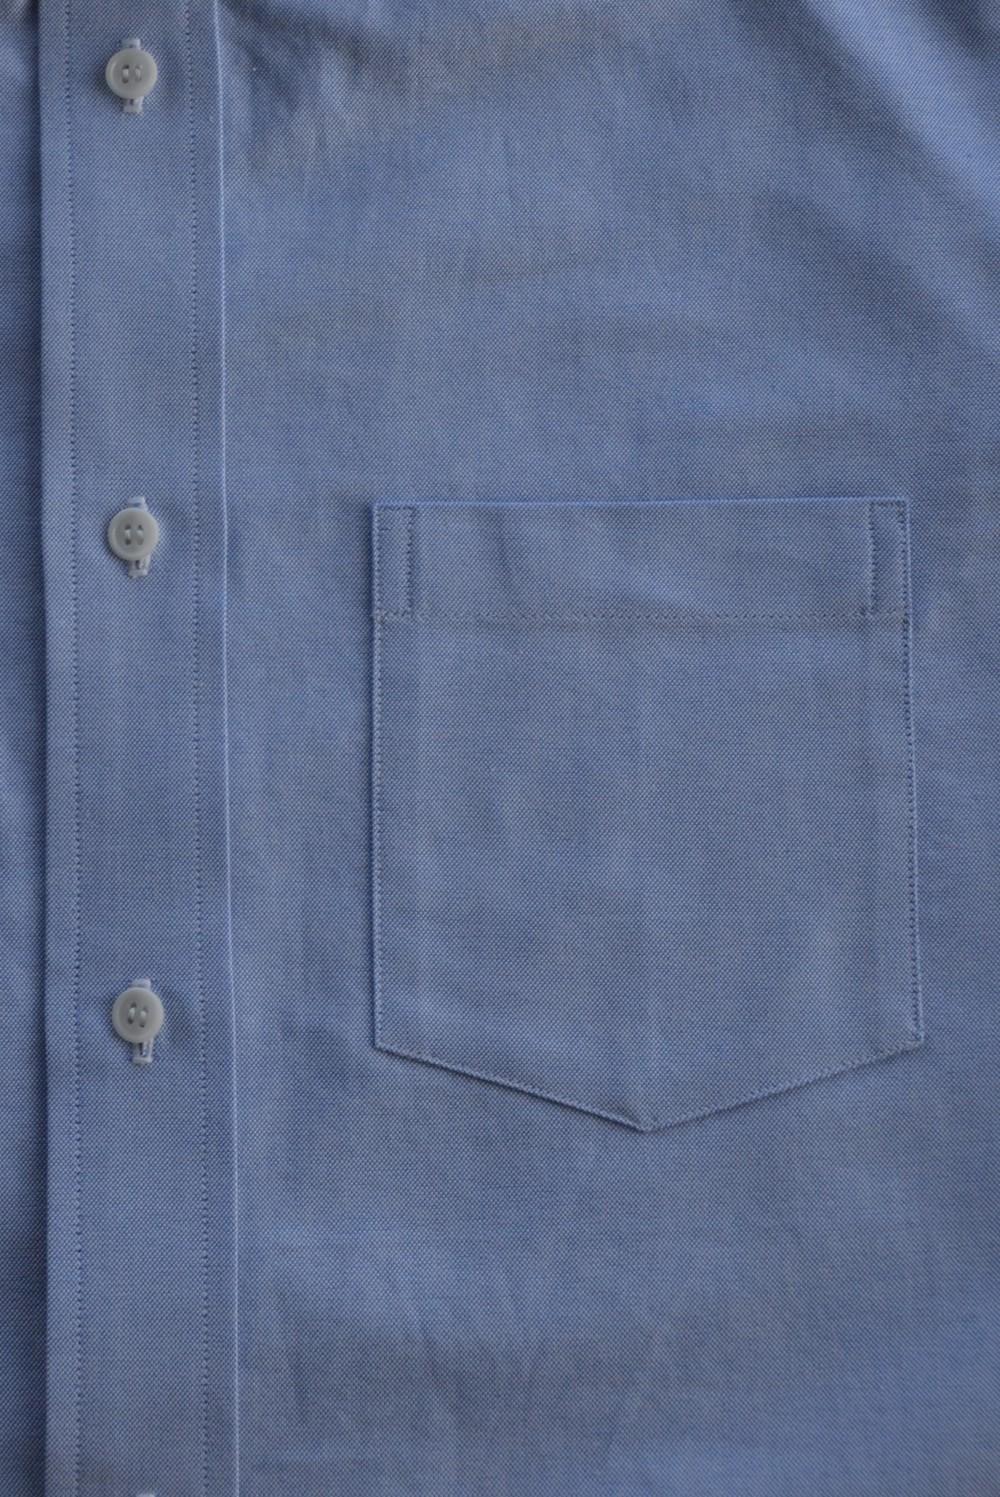 Traditional pocket